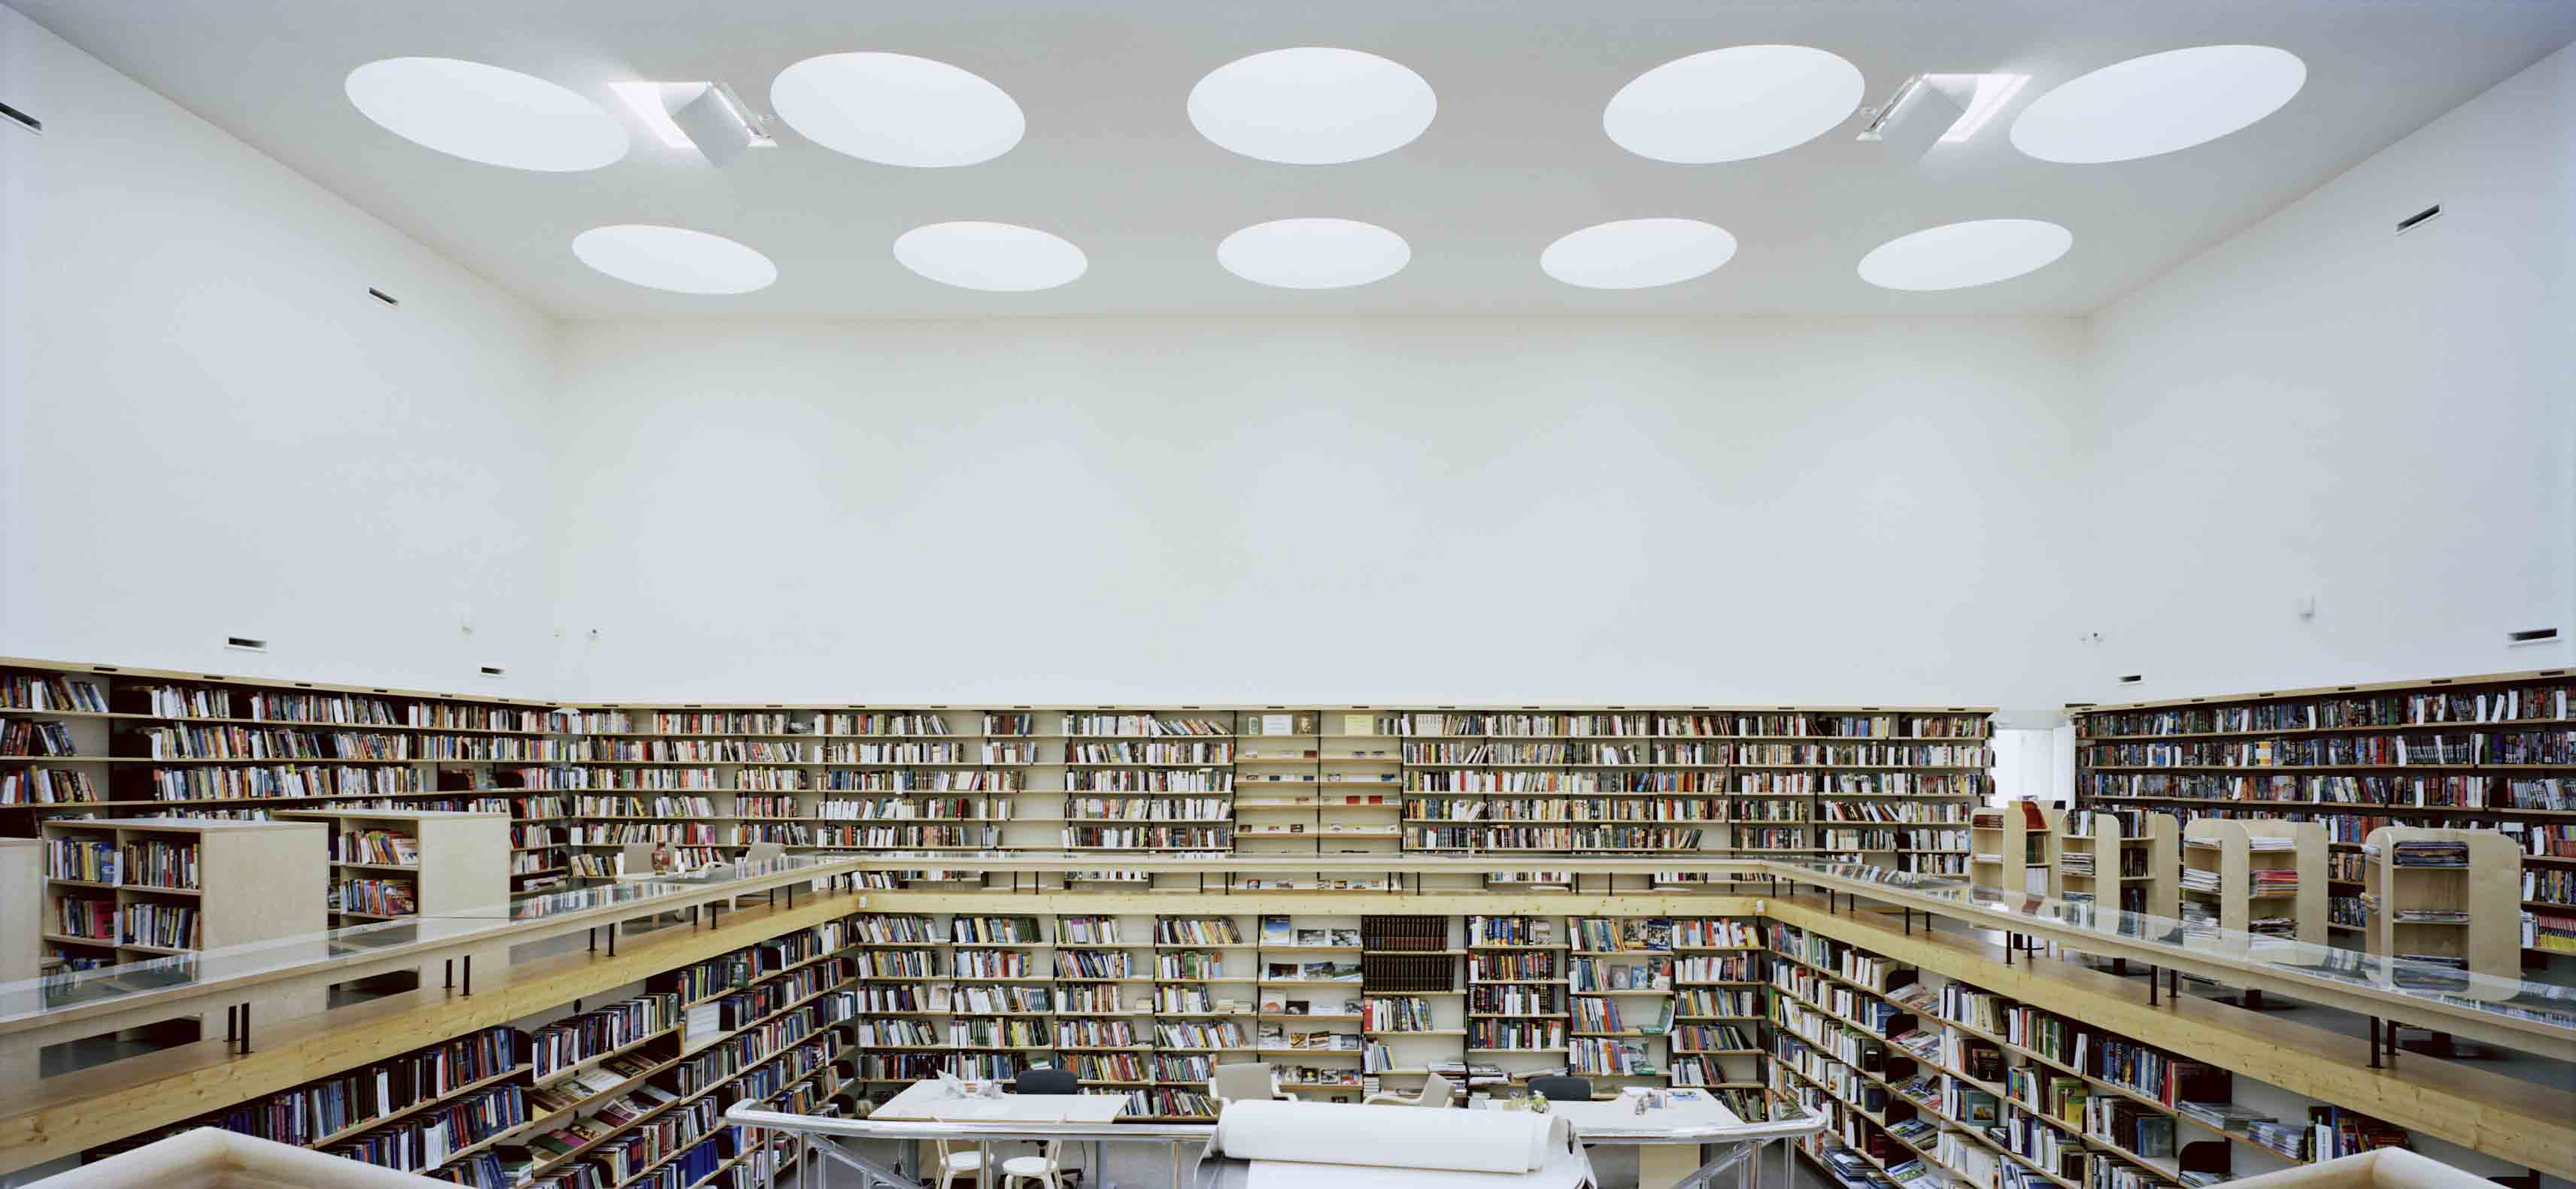 Armin Linke, bibliothèque de Viipuri ©Armin Linke, VG Bild-Kunst, Bonn, 2014